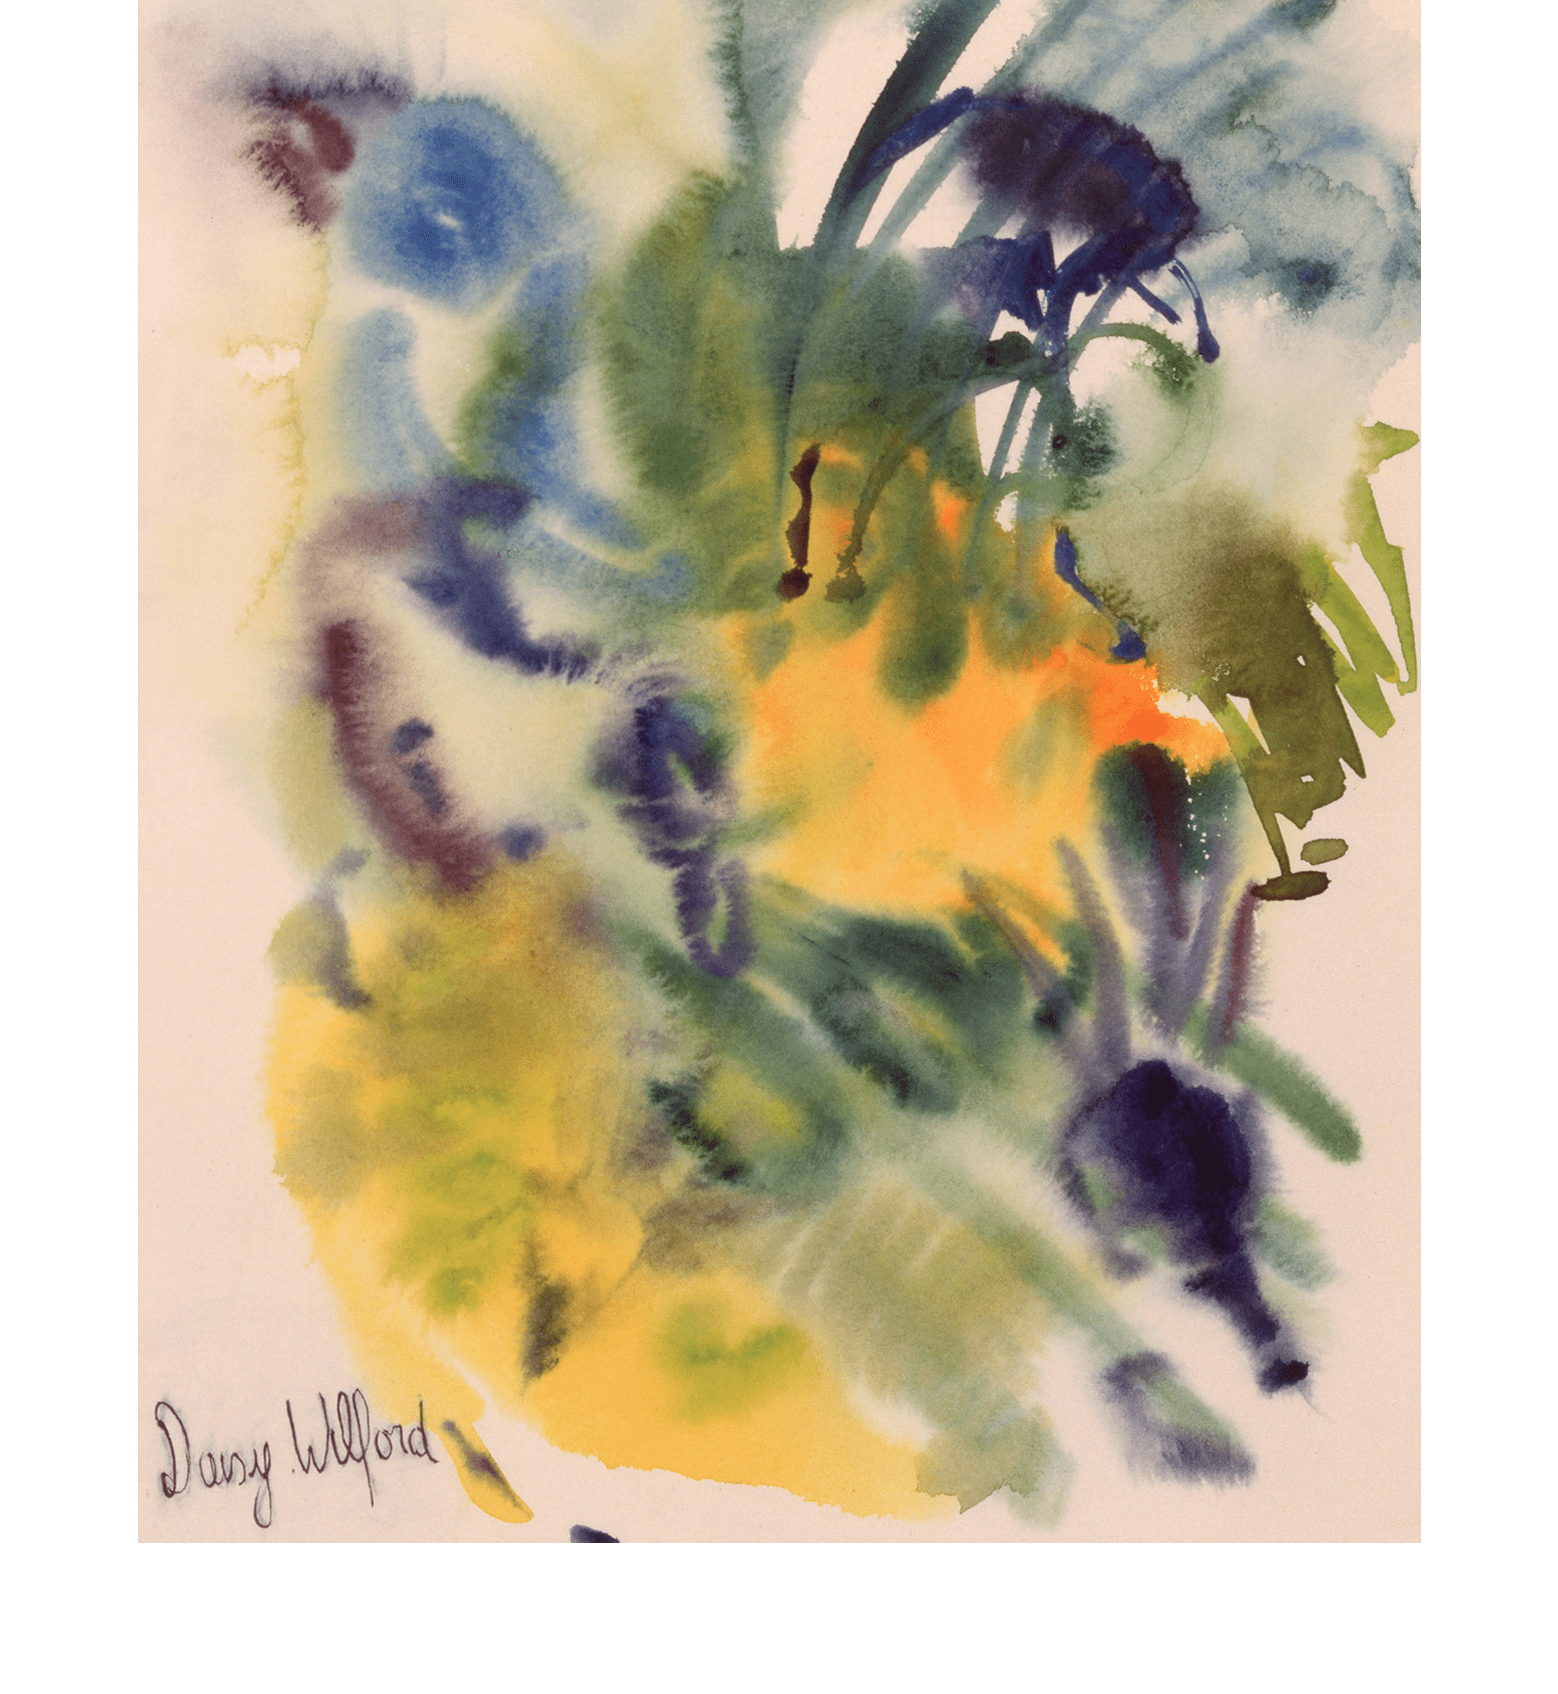 Jardin exotique (1986)